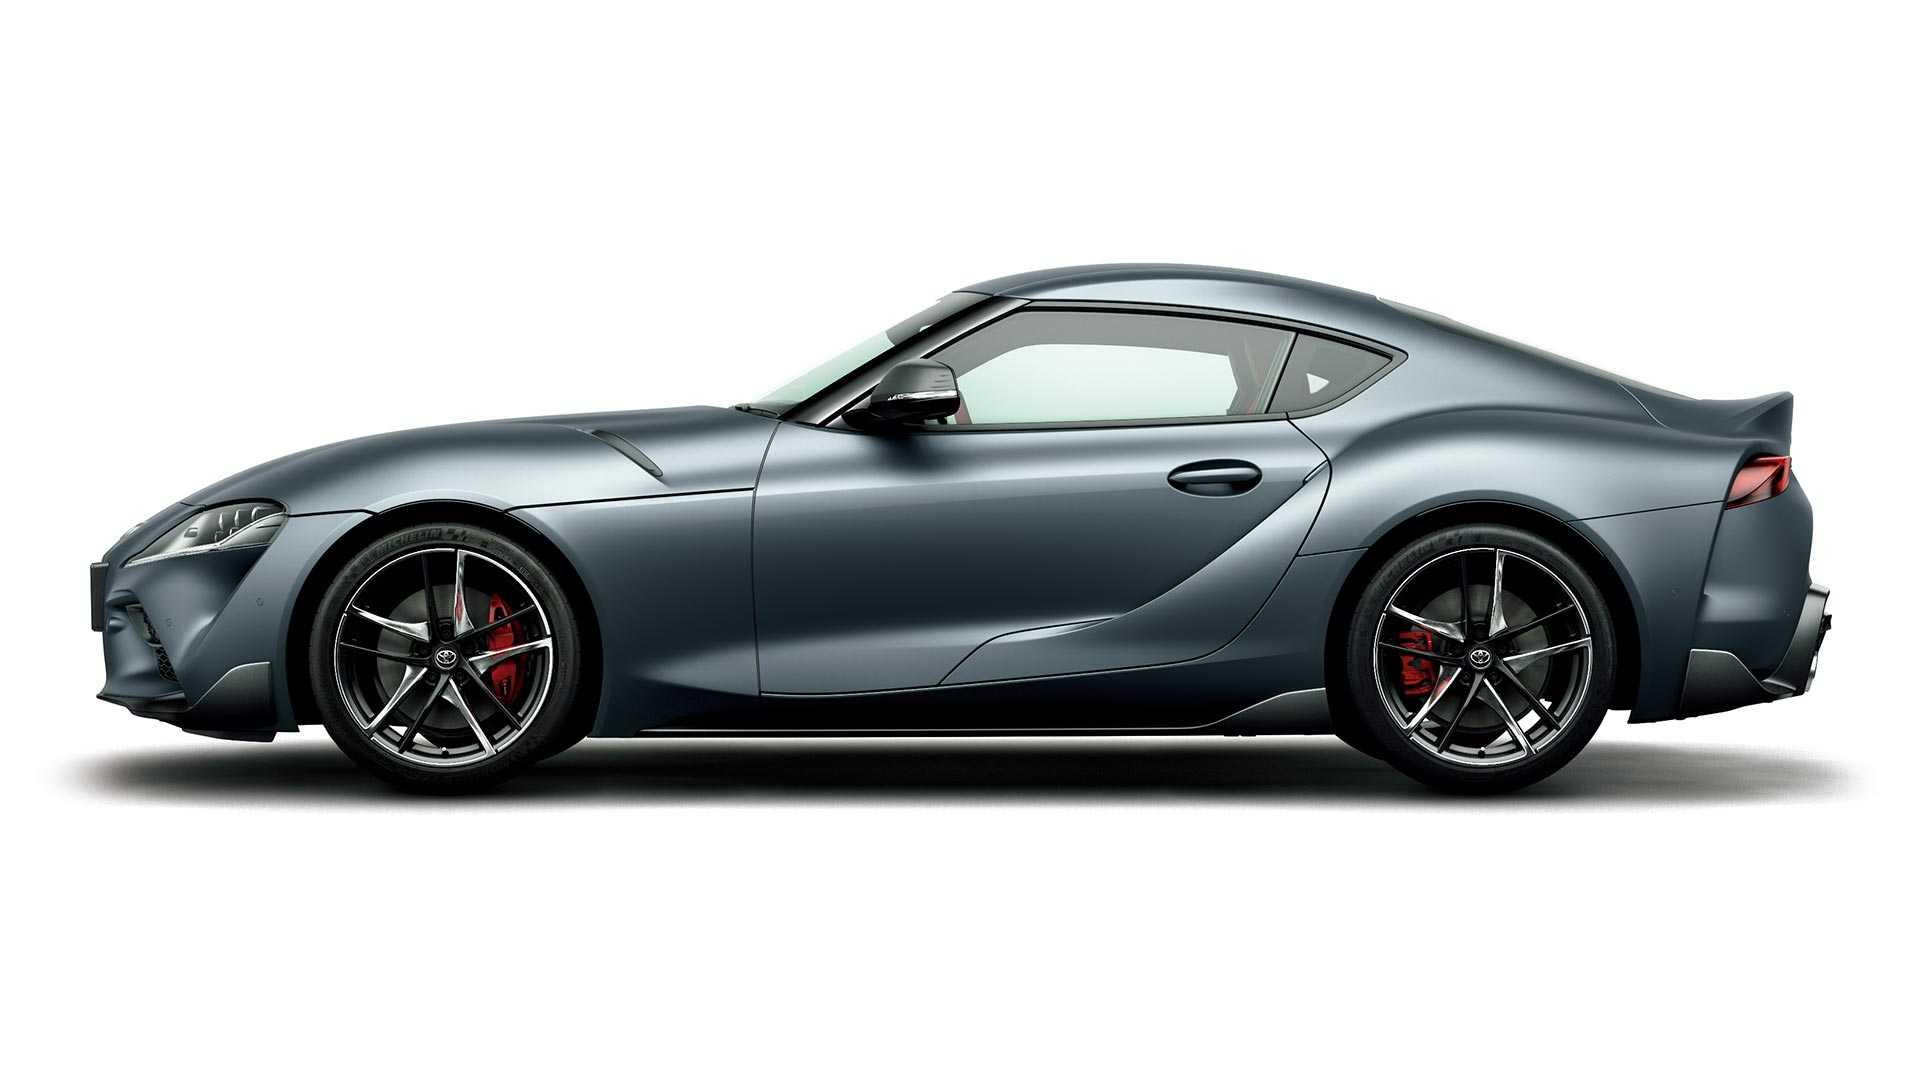 1_Toyota-Supra-Matte-Storm-Gray-3